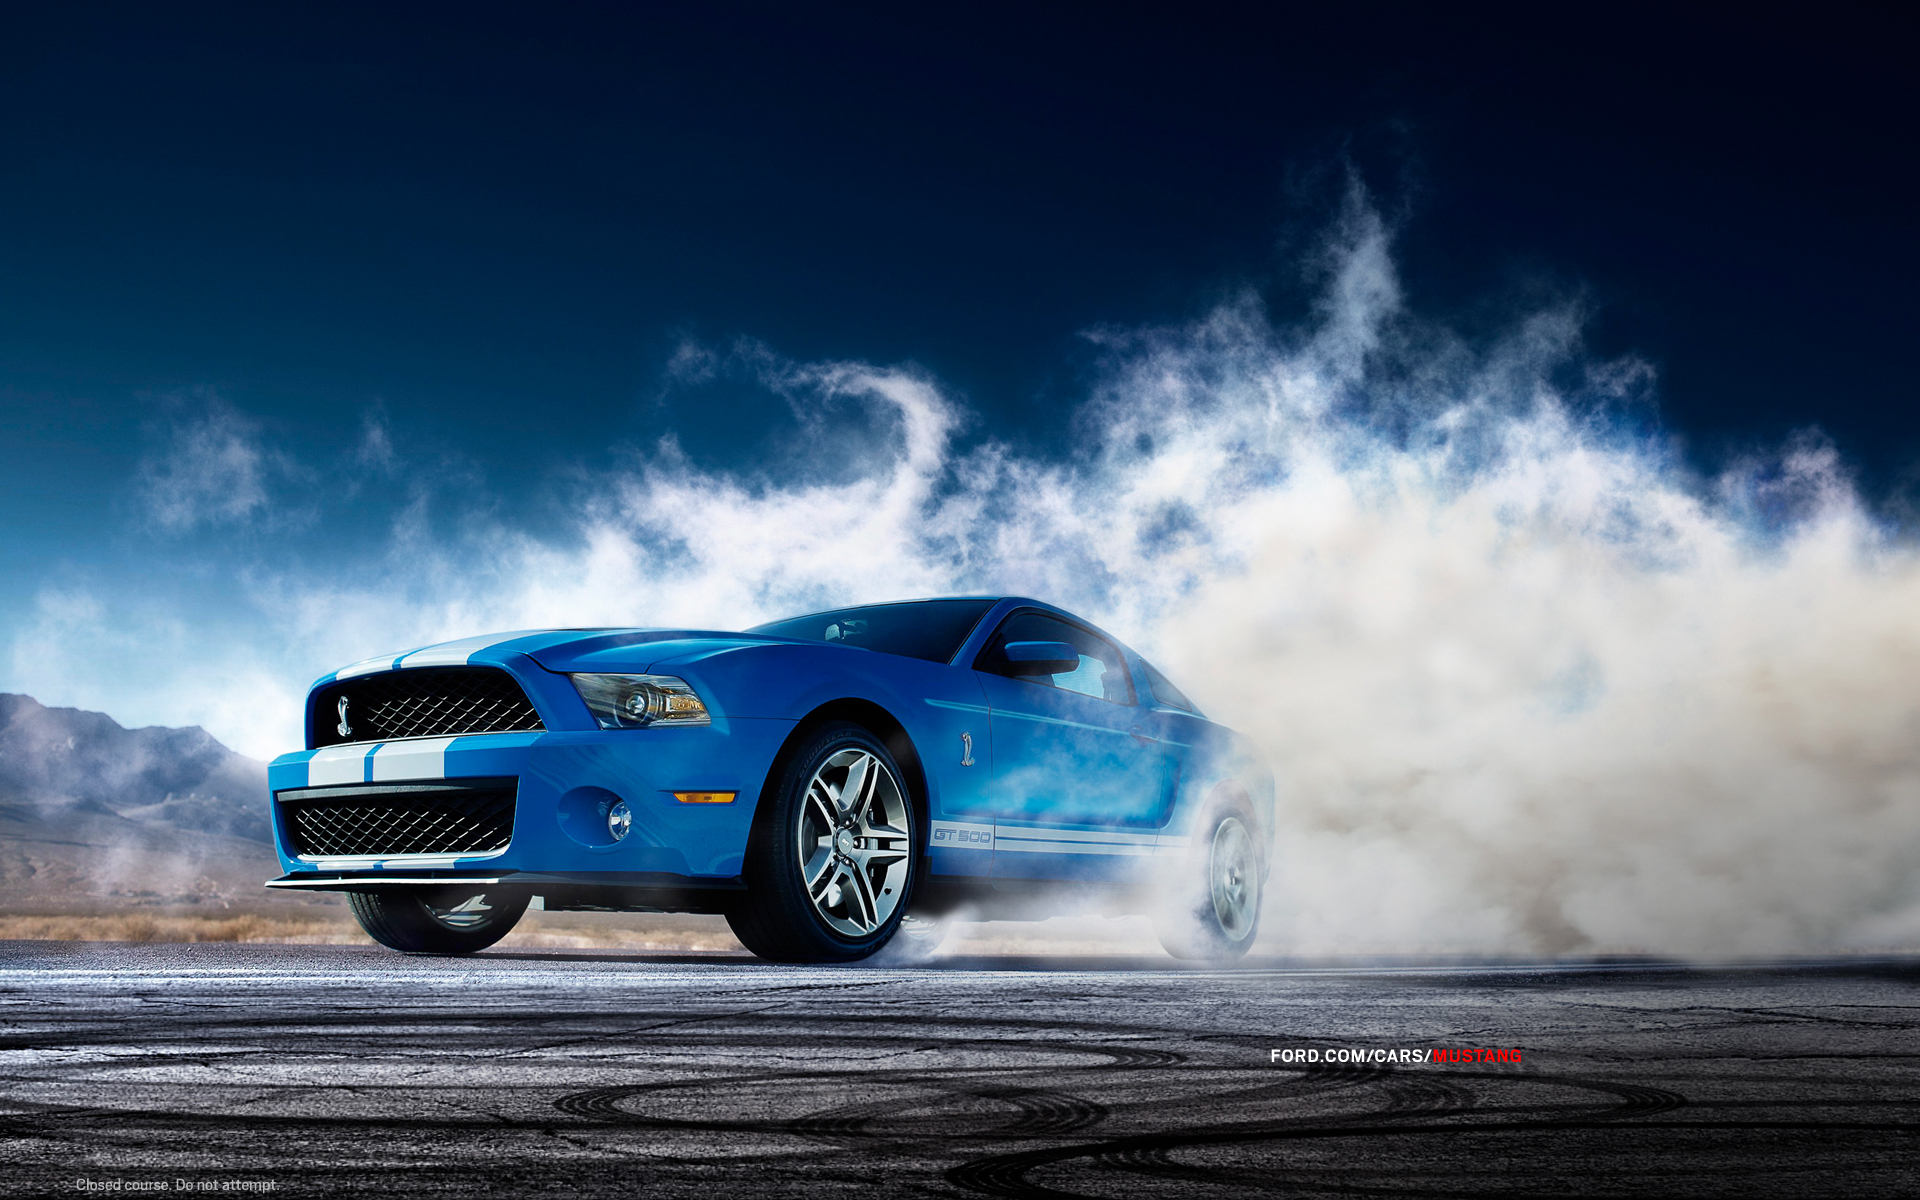 mustang car wallpaper 24 Mustang 2012 Shelby 4 Car Desktop Backgrounds 1920x1200